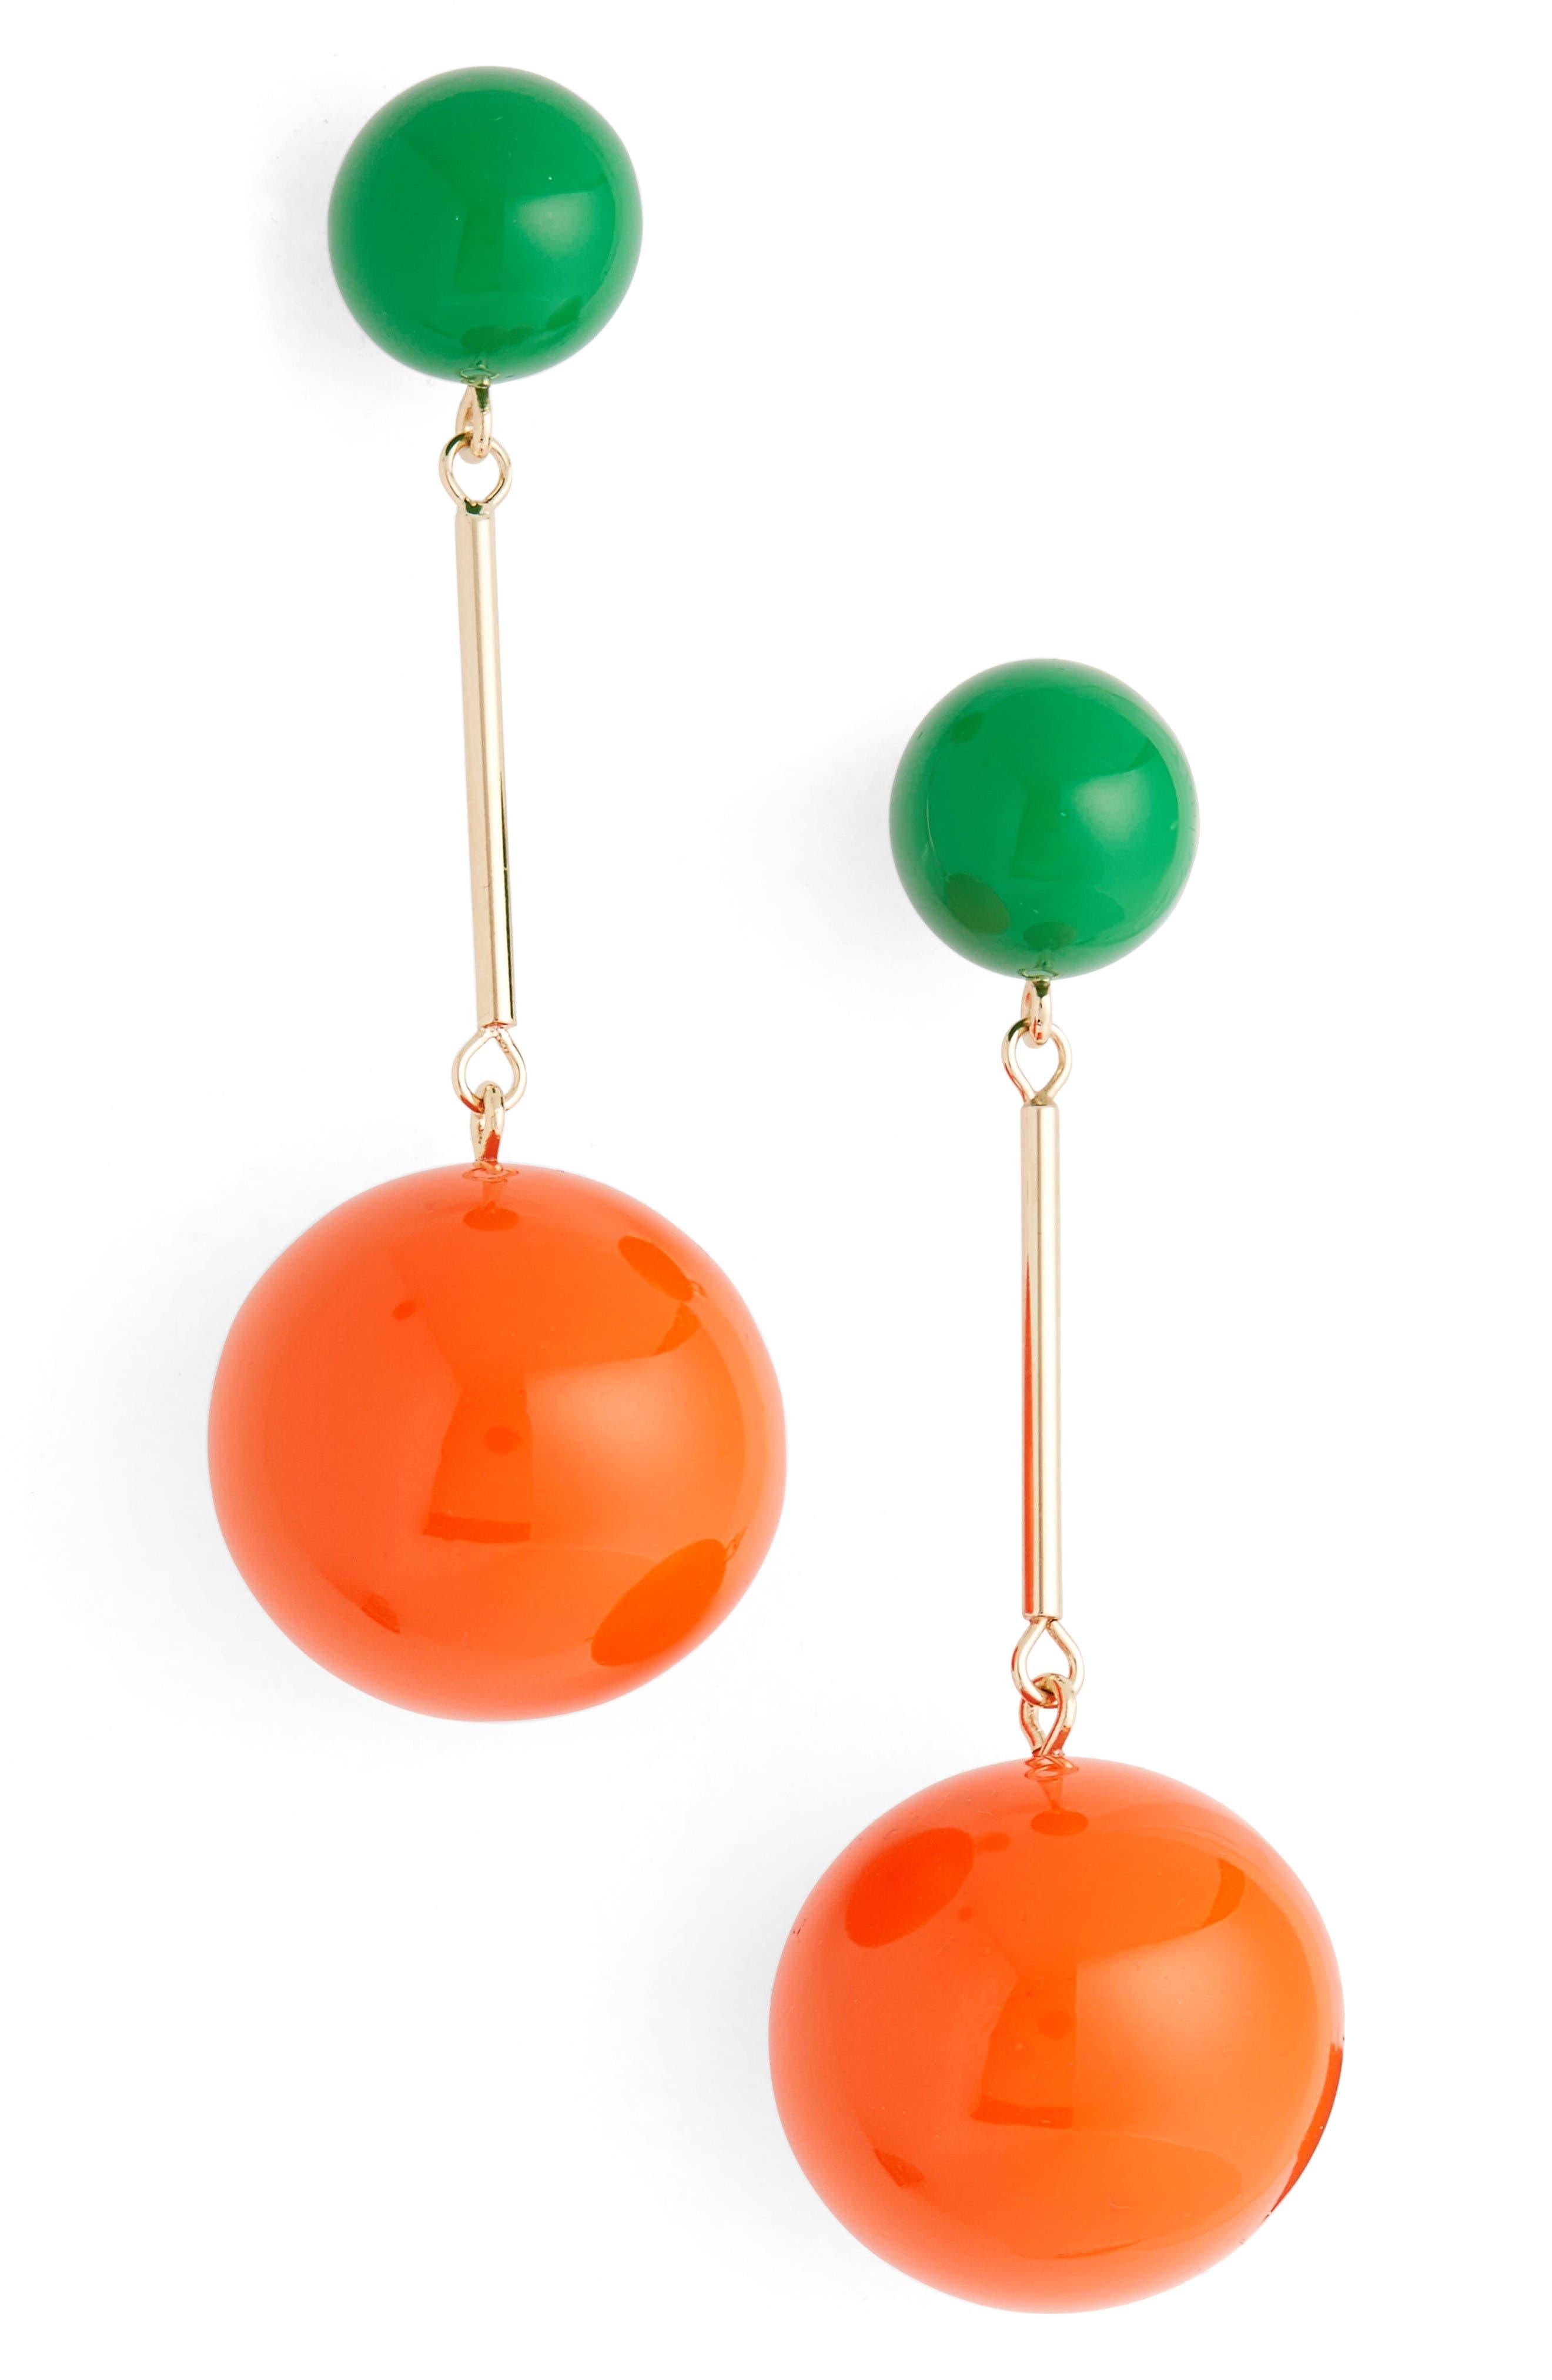 J.W.ANDERSON Sphere Drop Earrings,                         Main,                         color, Tangerine/Green